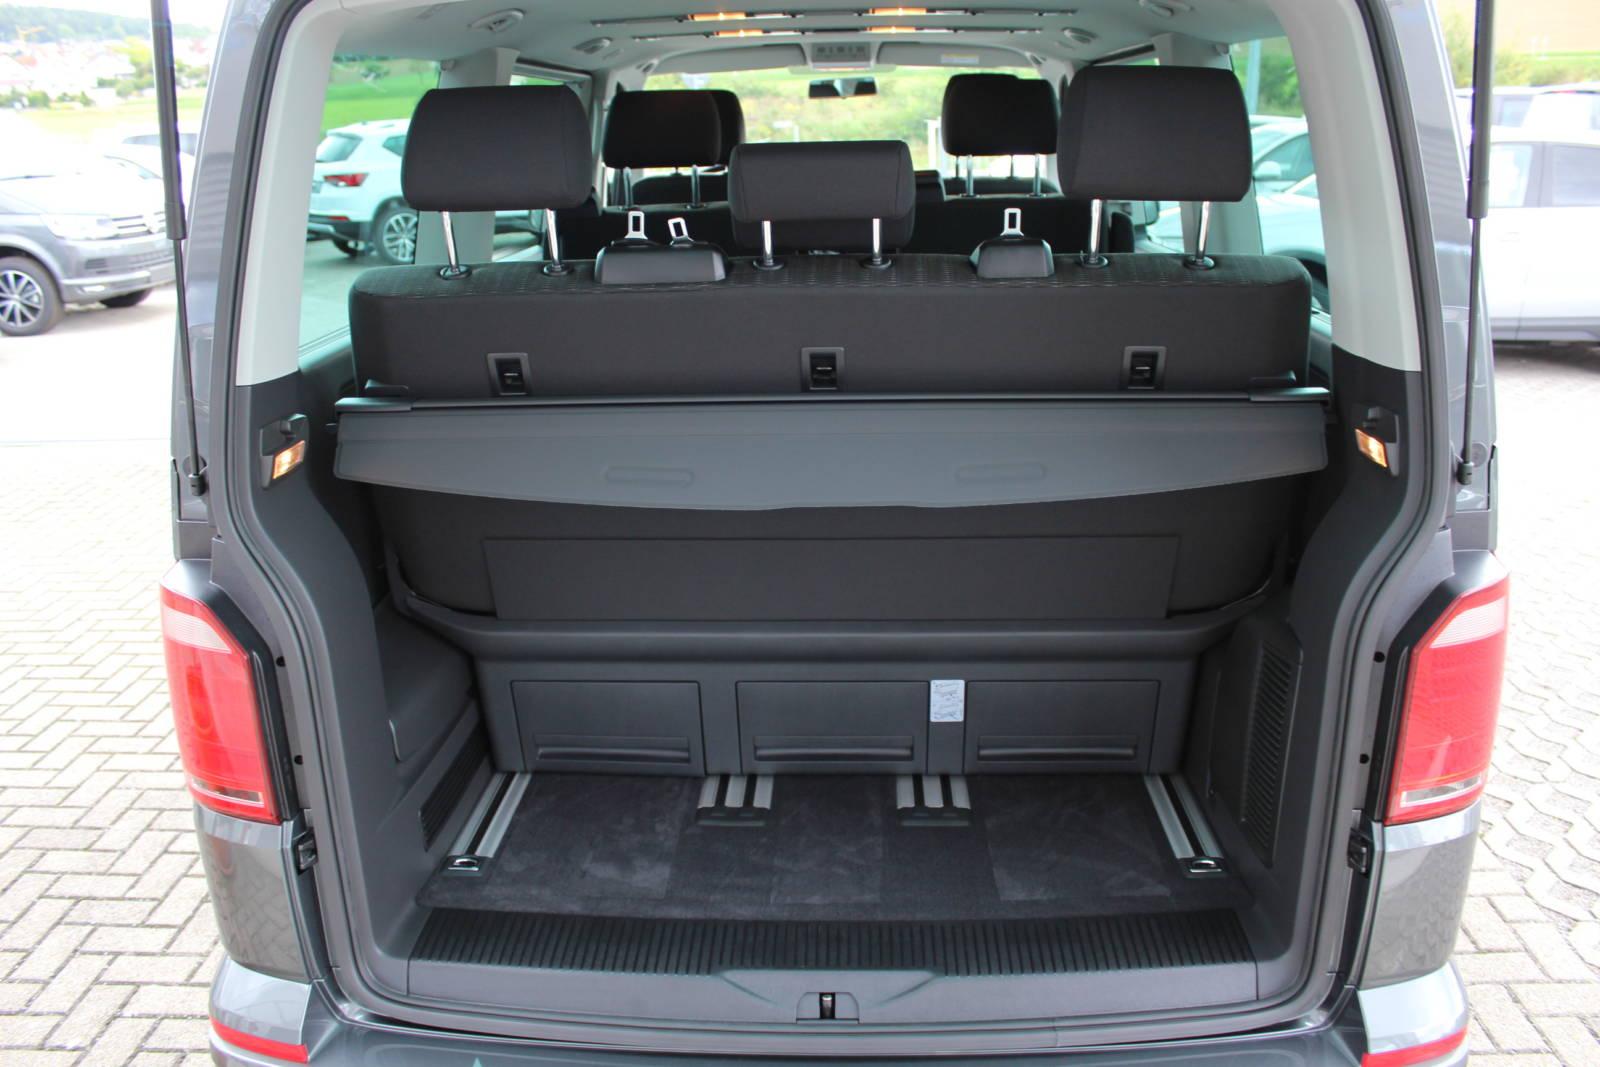 VW T6 Multivan Comfortline 2.0 TDI DSG / Deutsche Neufahrzeuge und EU-Neufahrzeuge – Aha! Fahrzeughandel GmbH in Althengstett